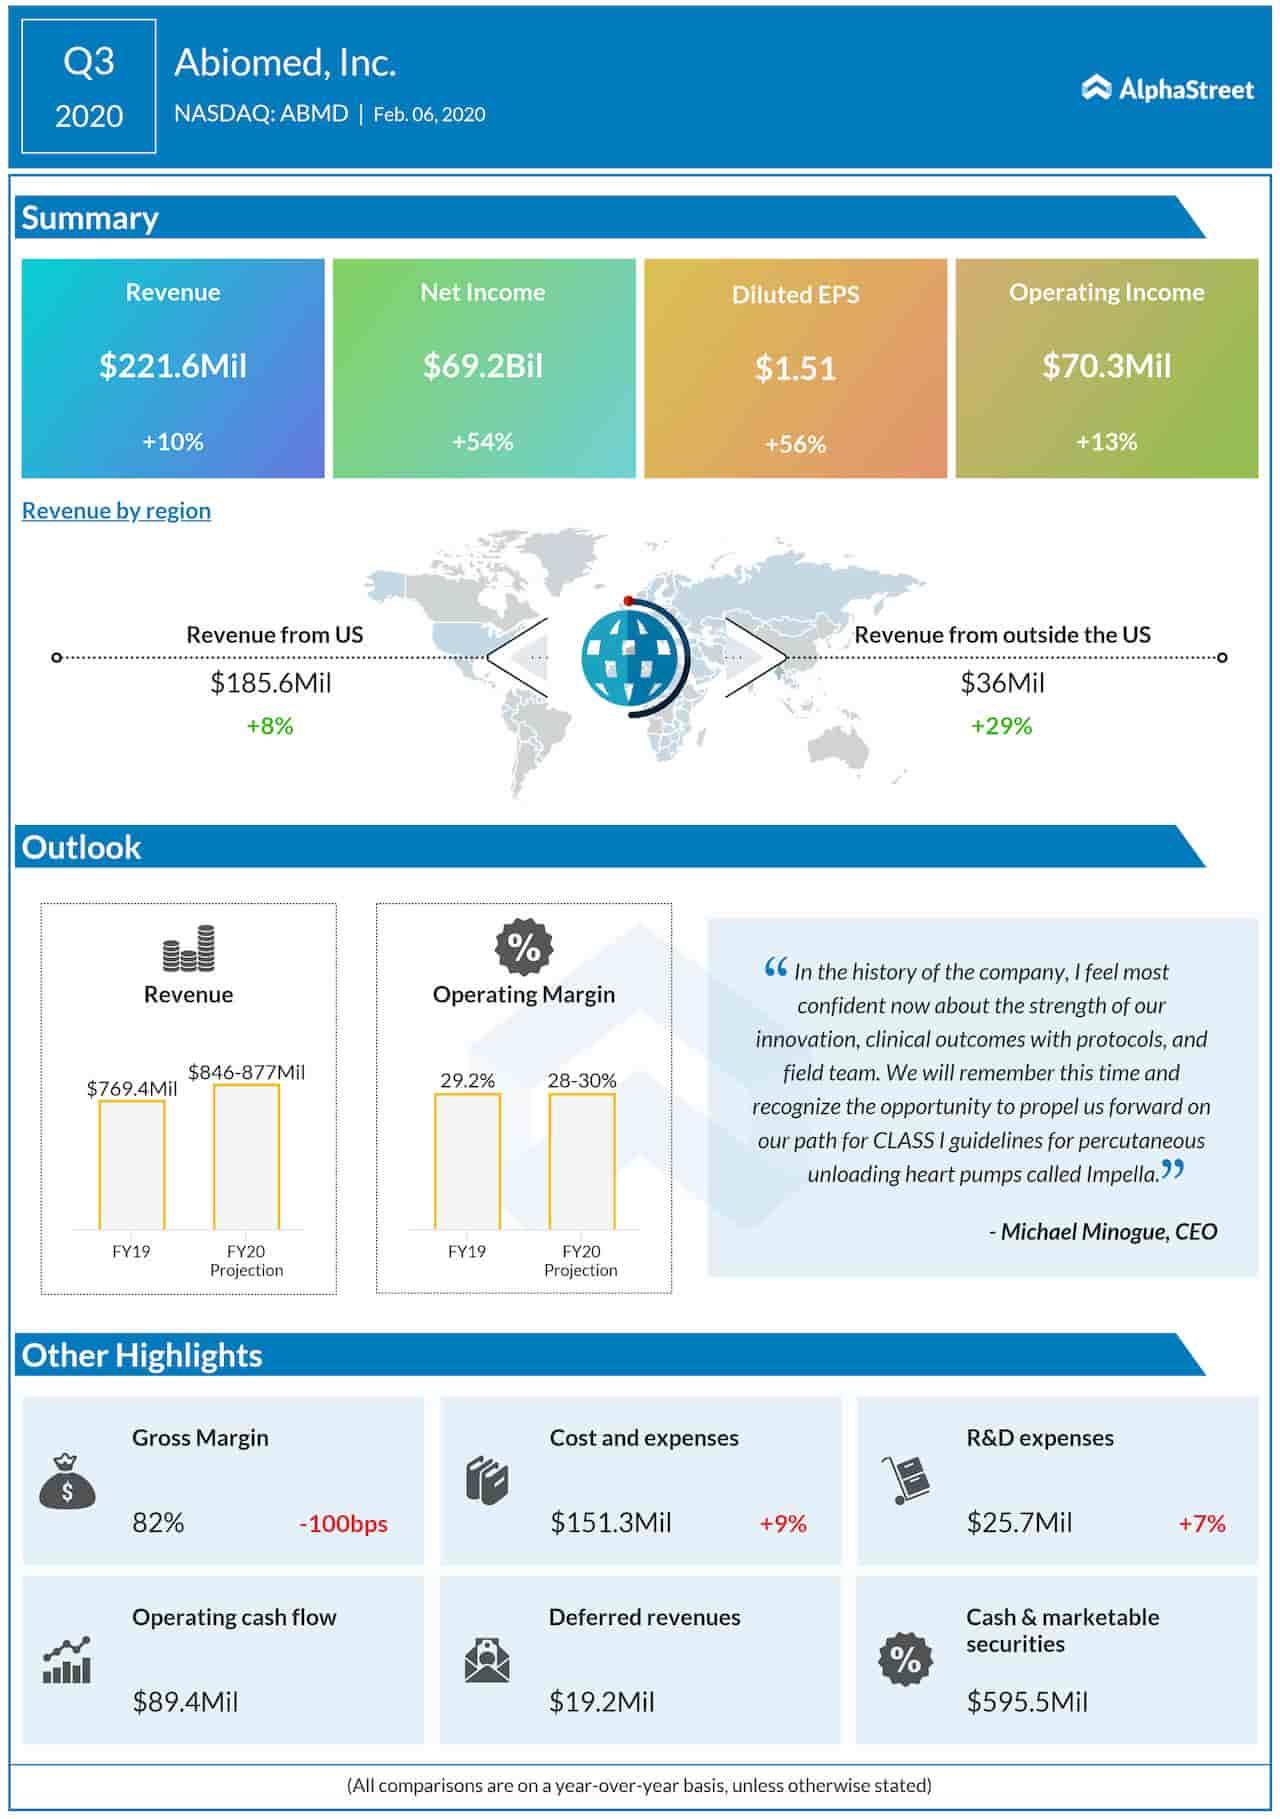 Abiomed, Inc. (NASDAQ: ABMD): Q3 2020 Earnings Snapshot